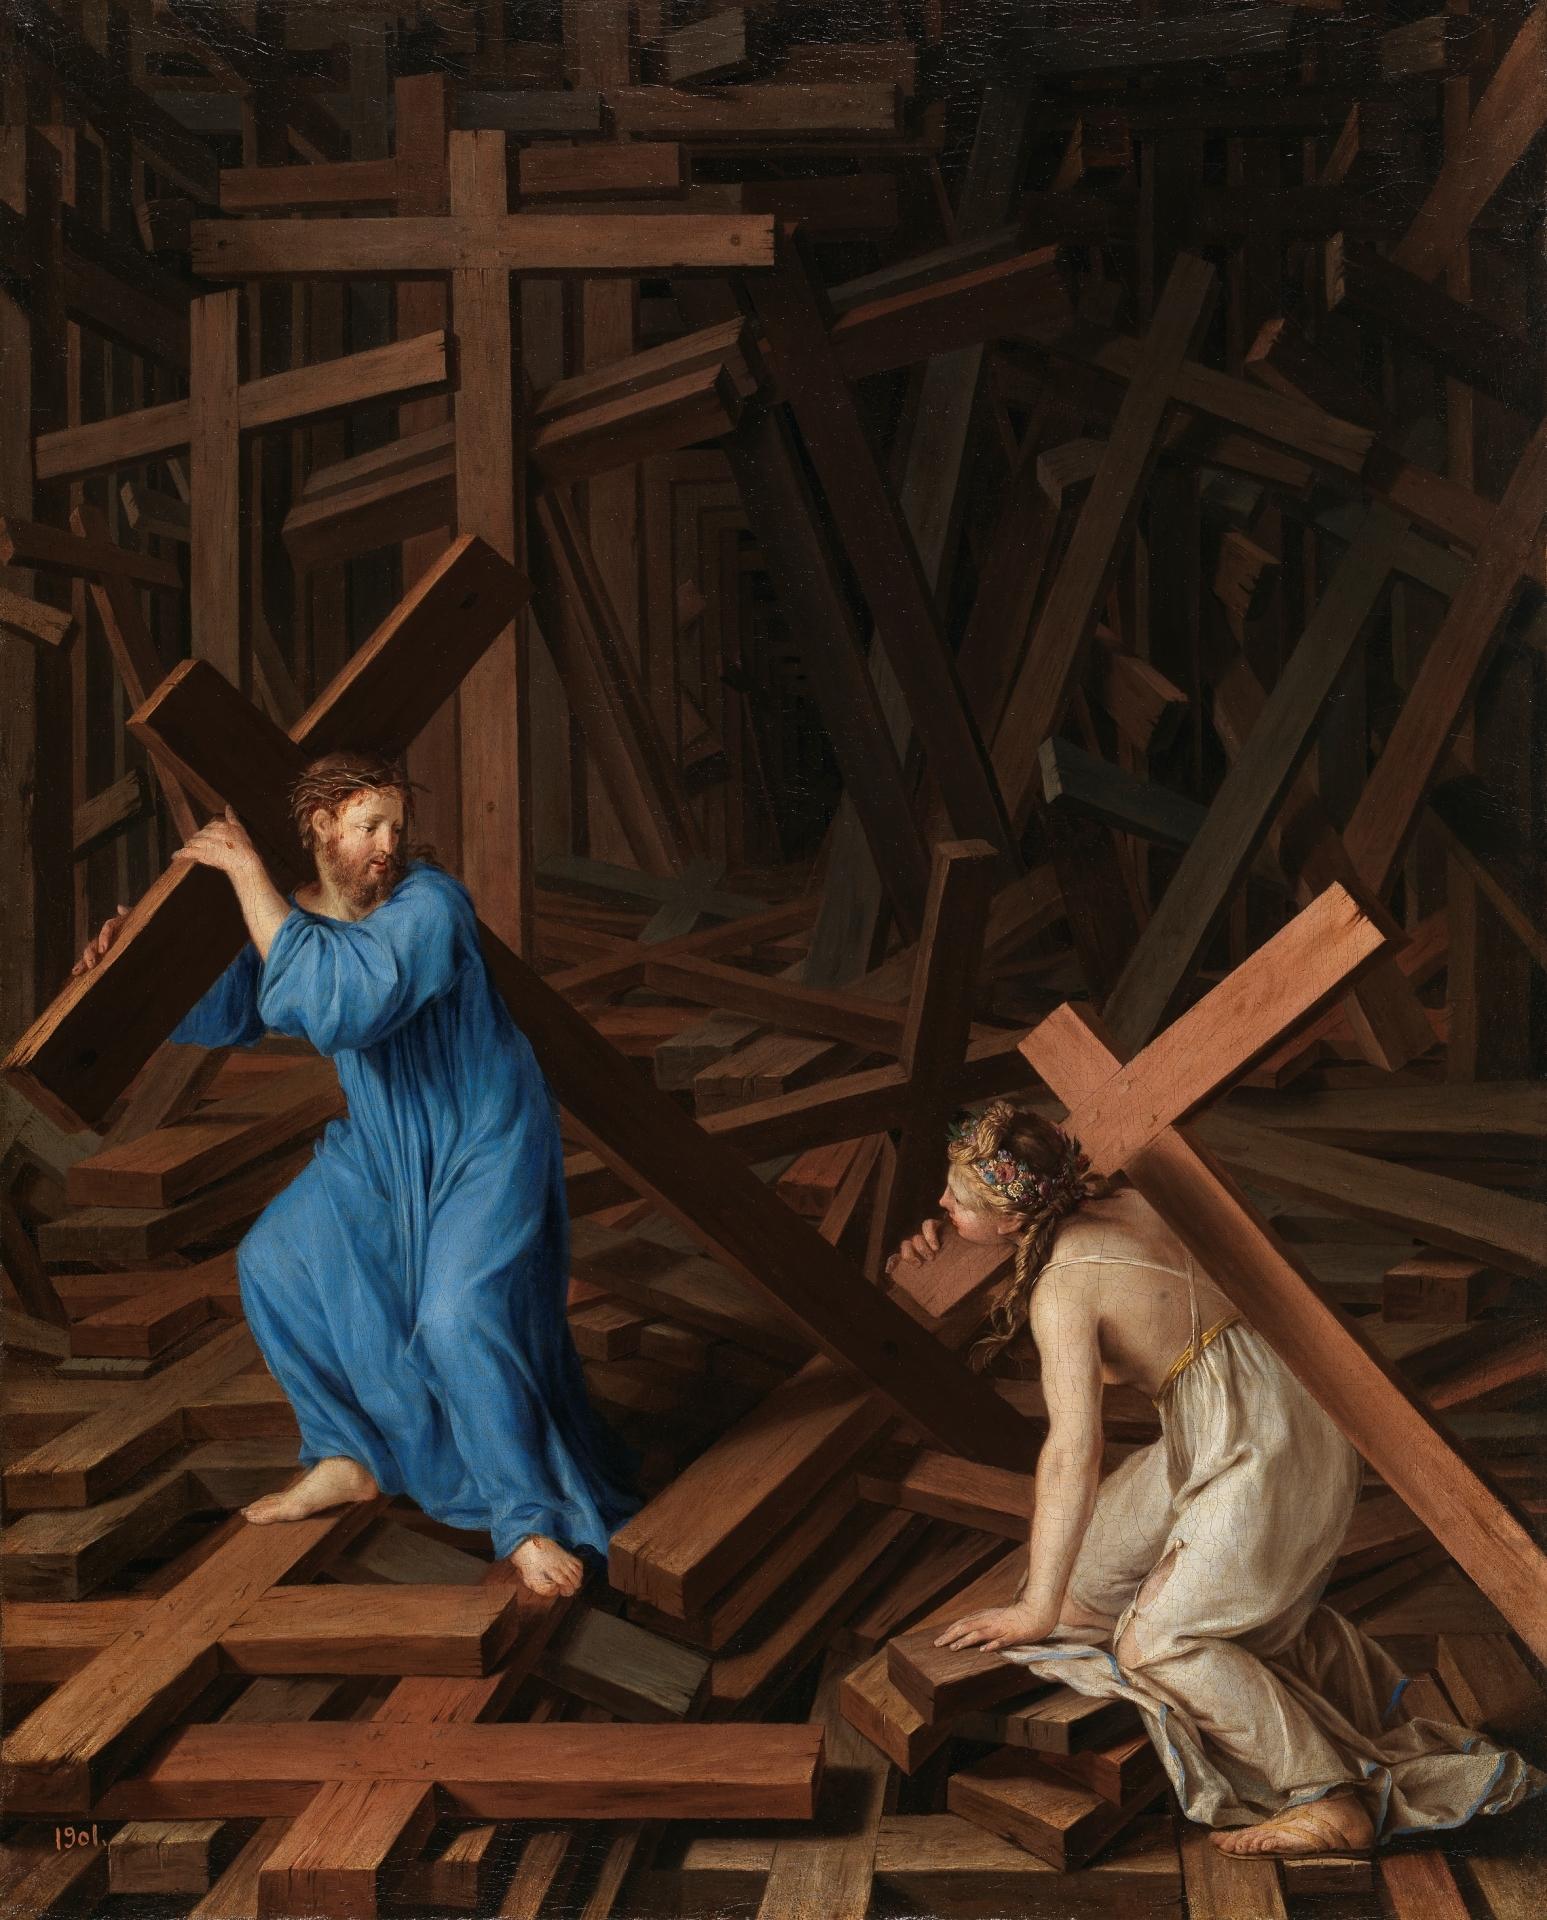 The Christian Soul accepts the Cross, c. 1630. Museo del Prado, Madrid, Spain. Via IllustratedPrayer.com